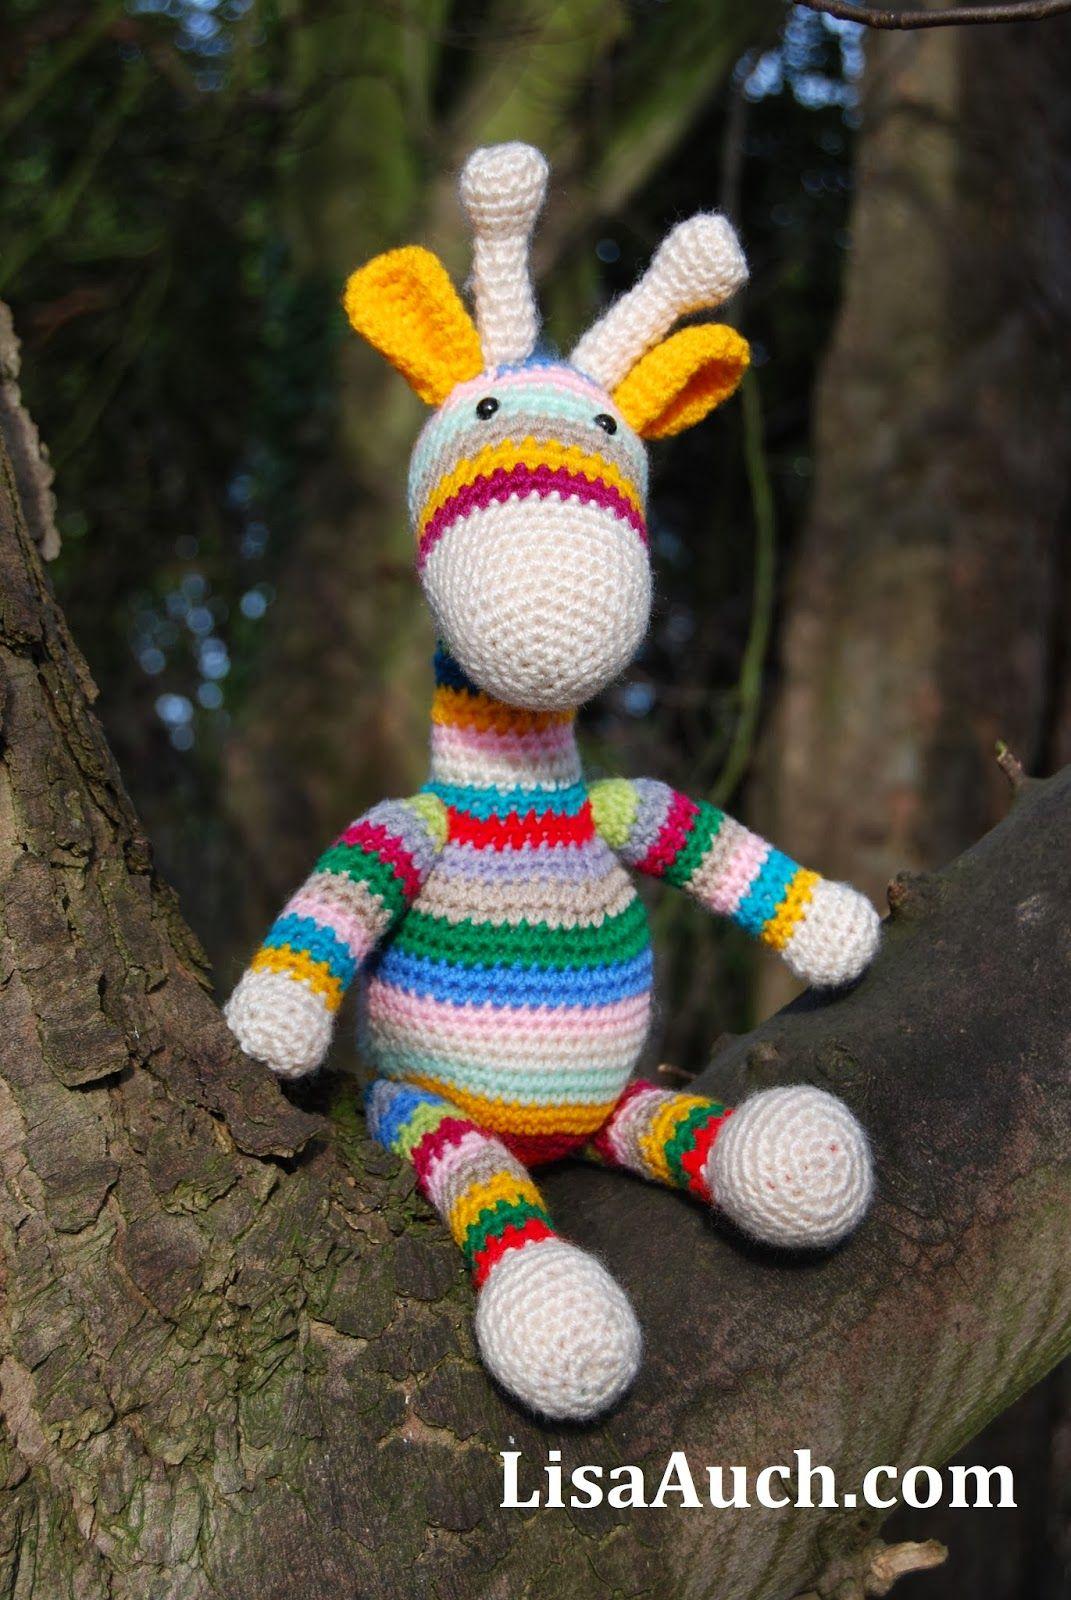 giraffe crochet patterns free- crochet toy patterns easy, lisaauch ...